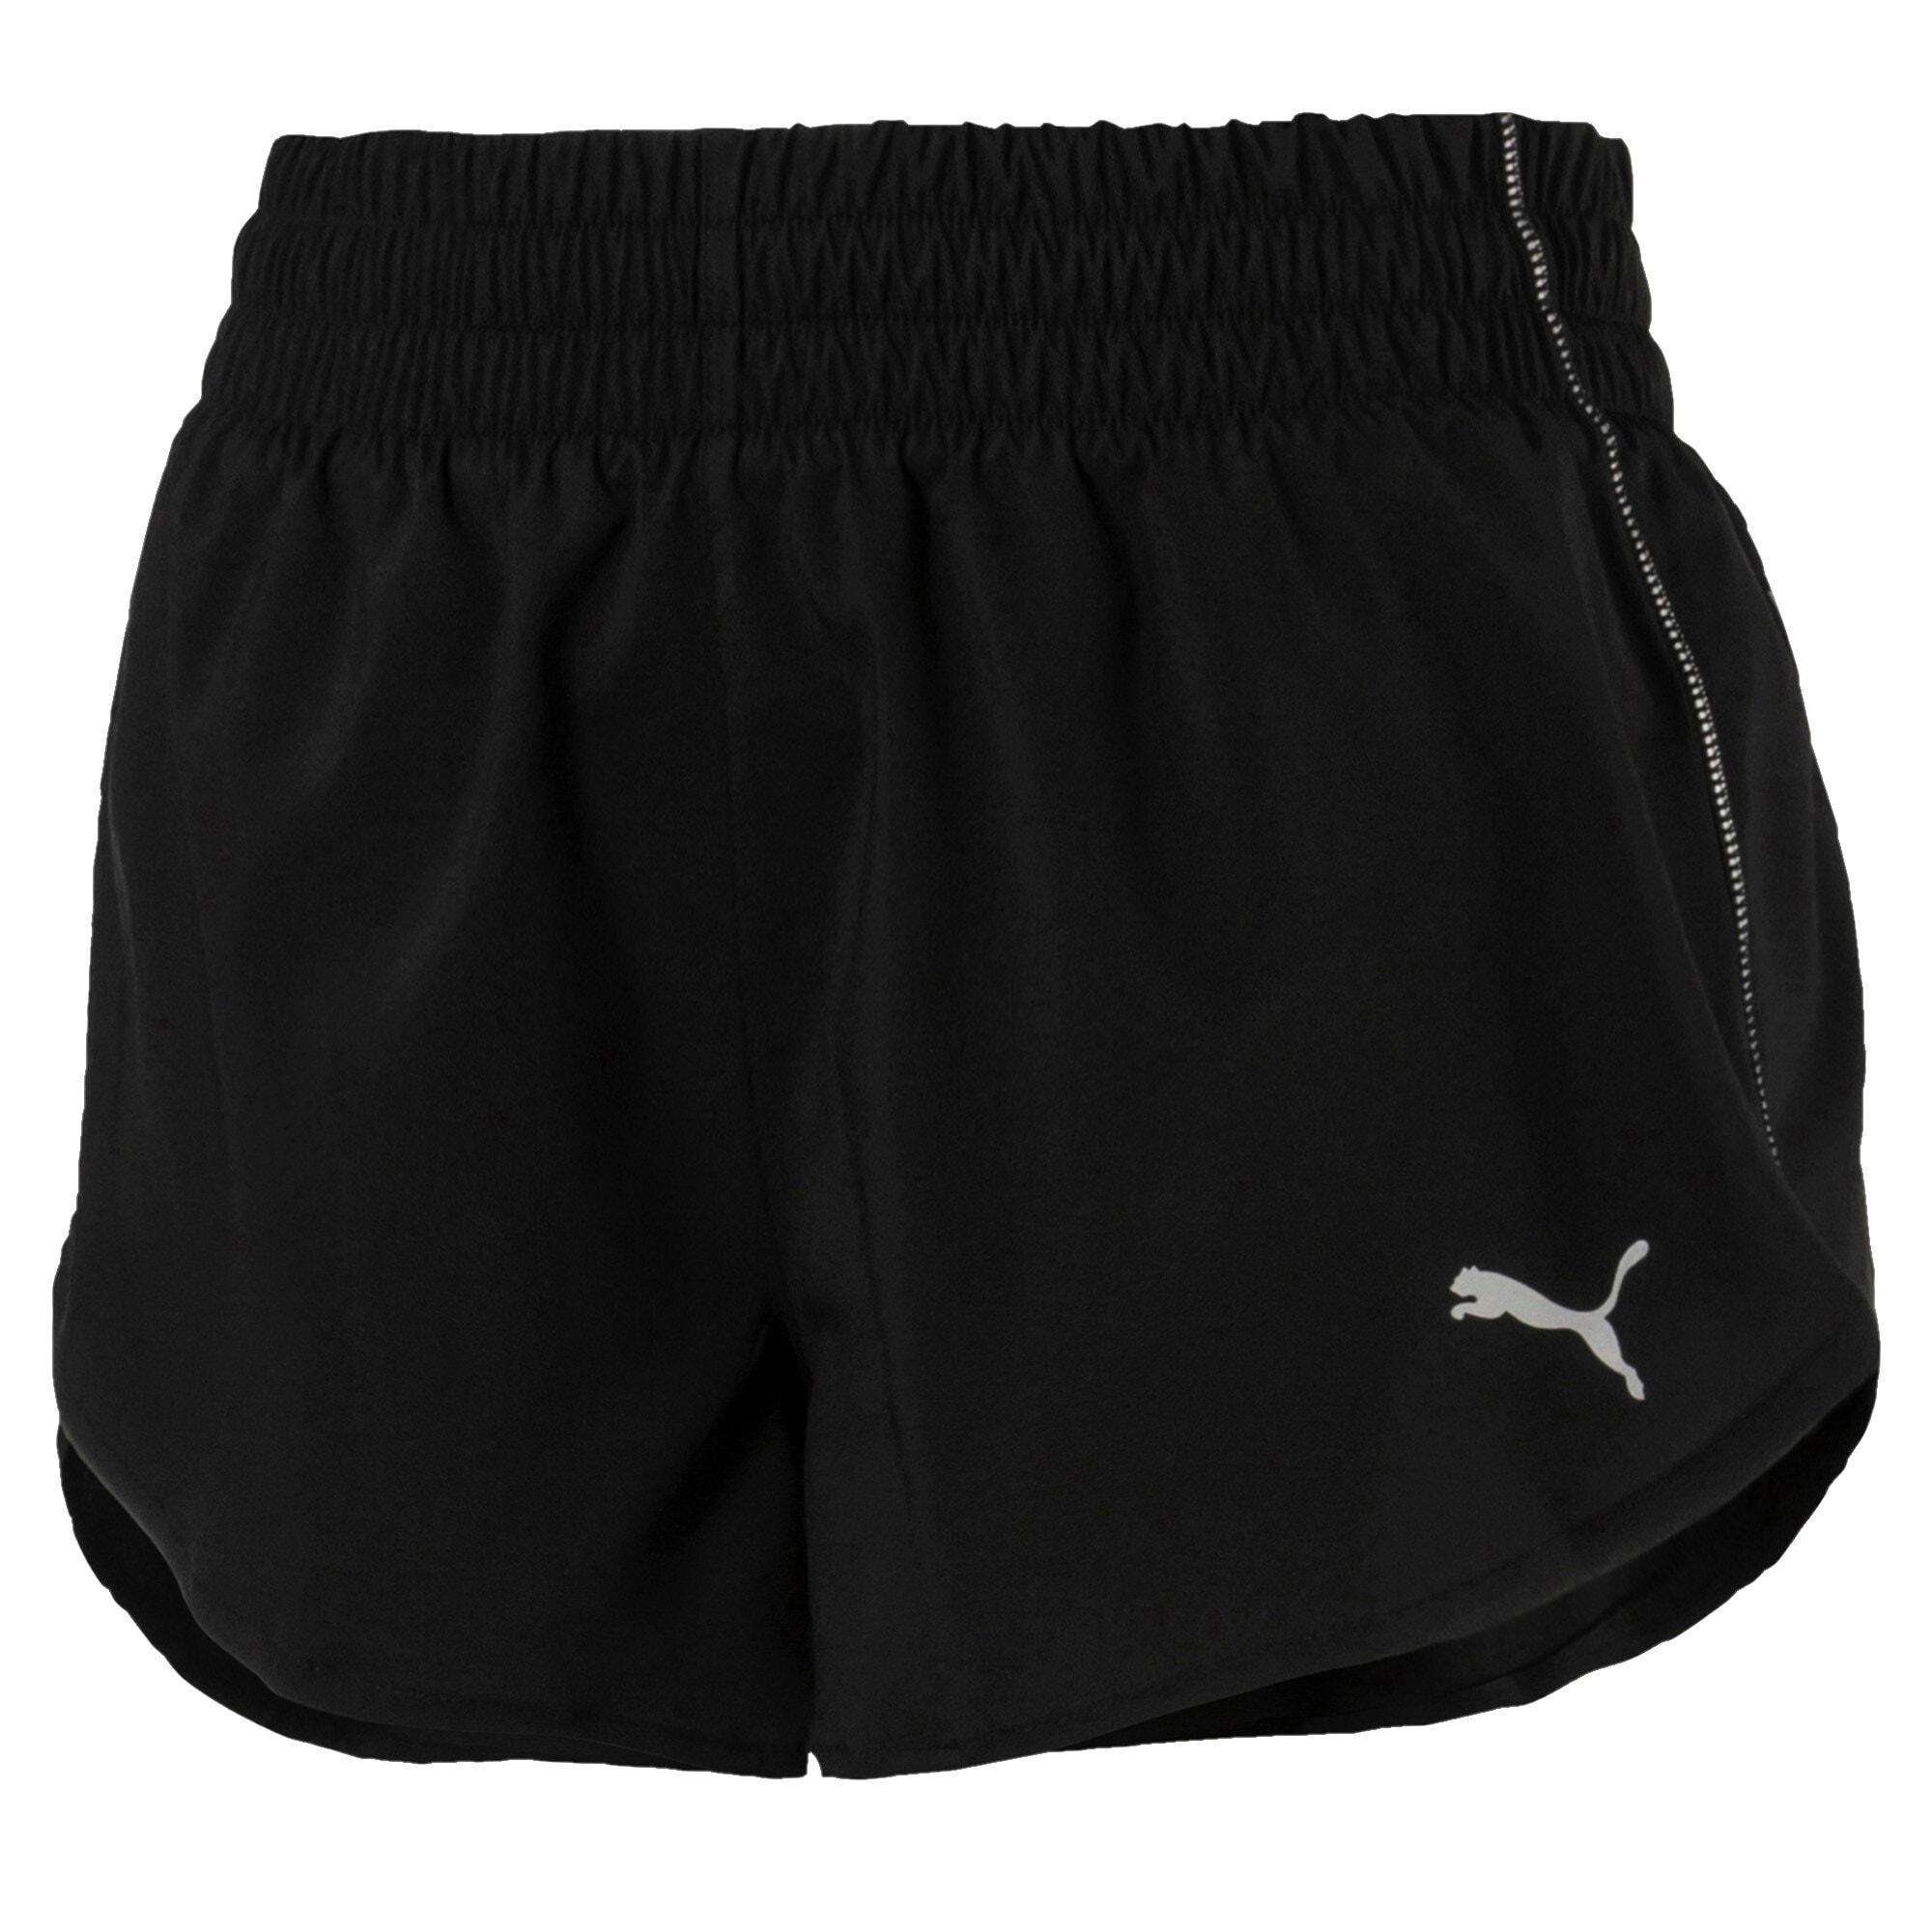 "Thumbnail 4 of Ignite 3"" Women's Shorts, Puma Black, medium"